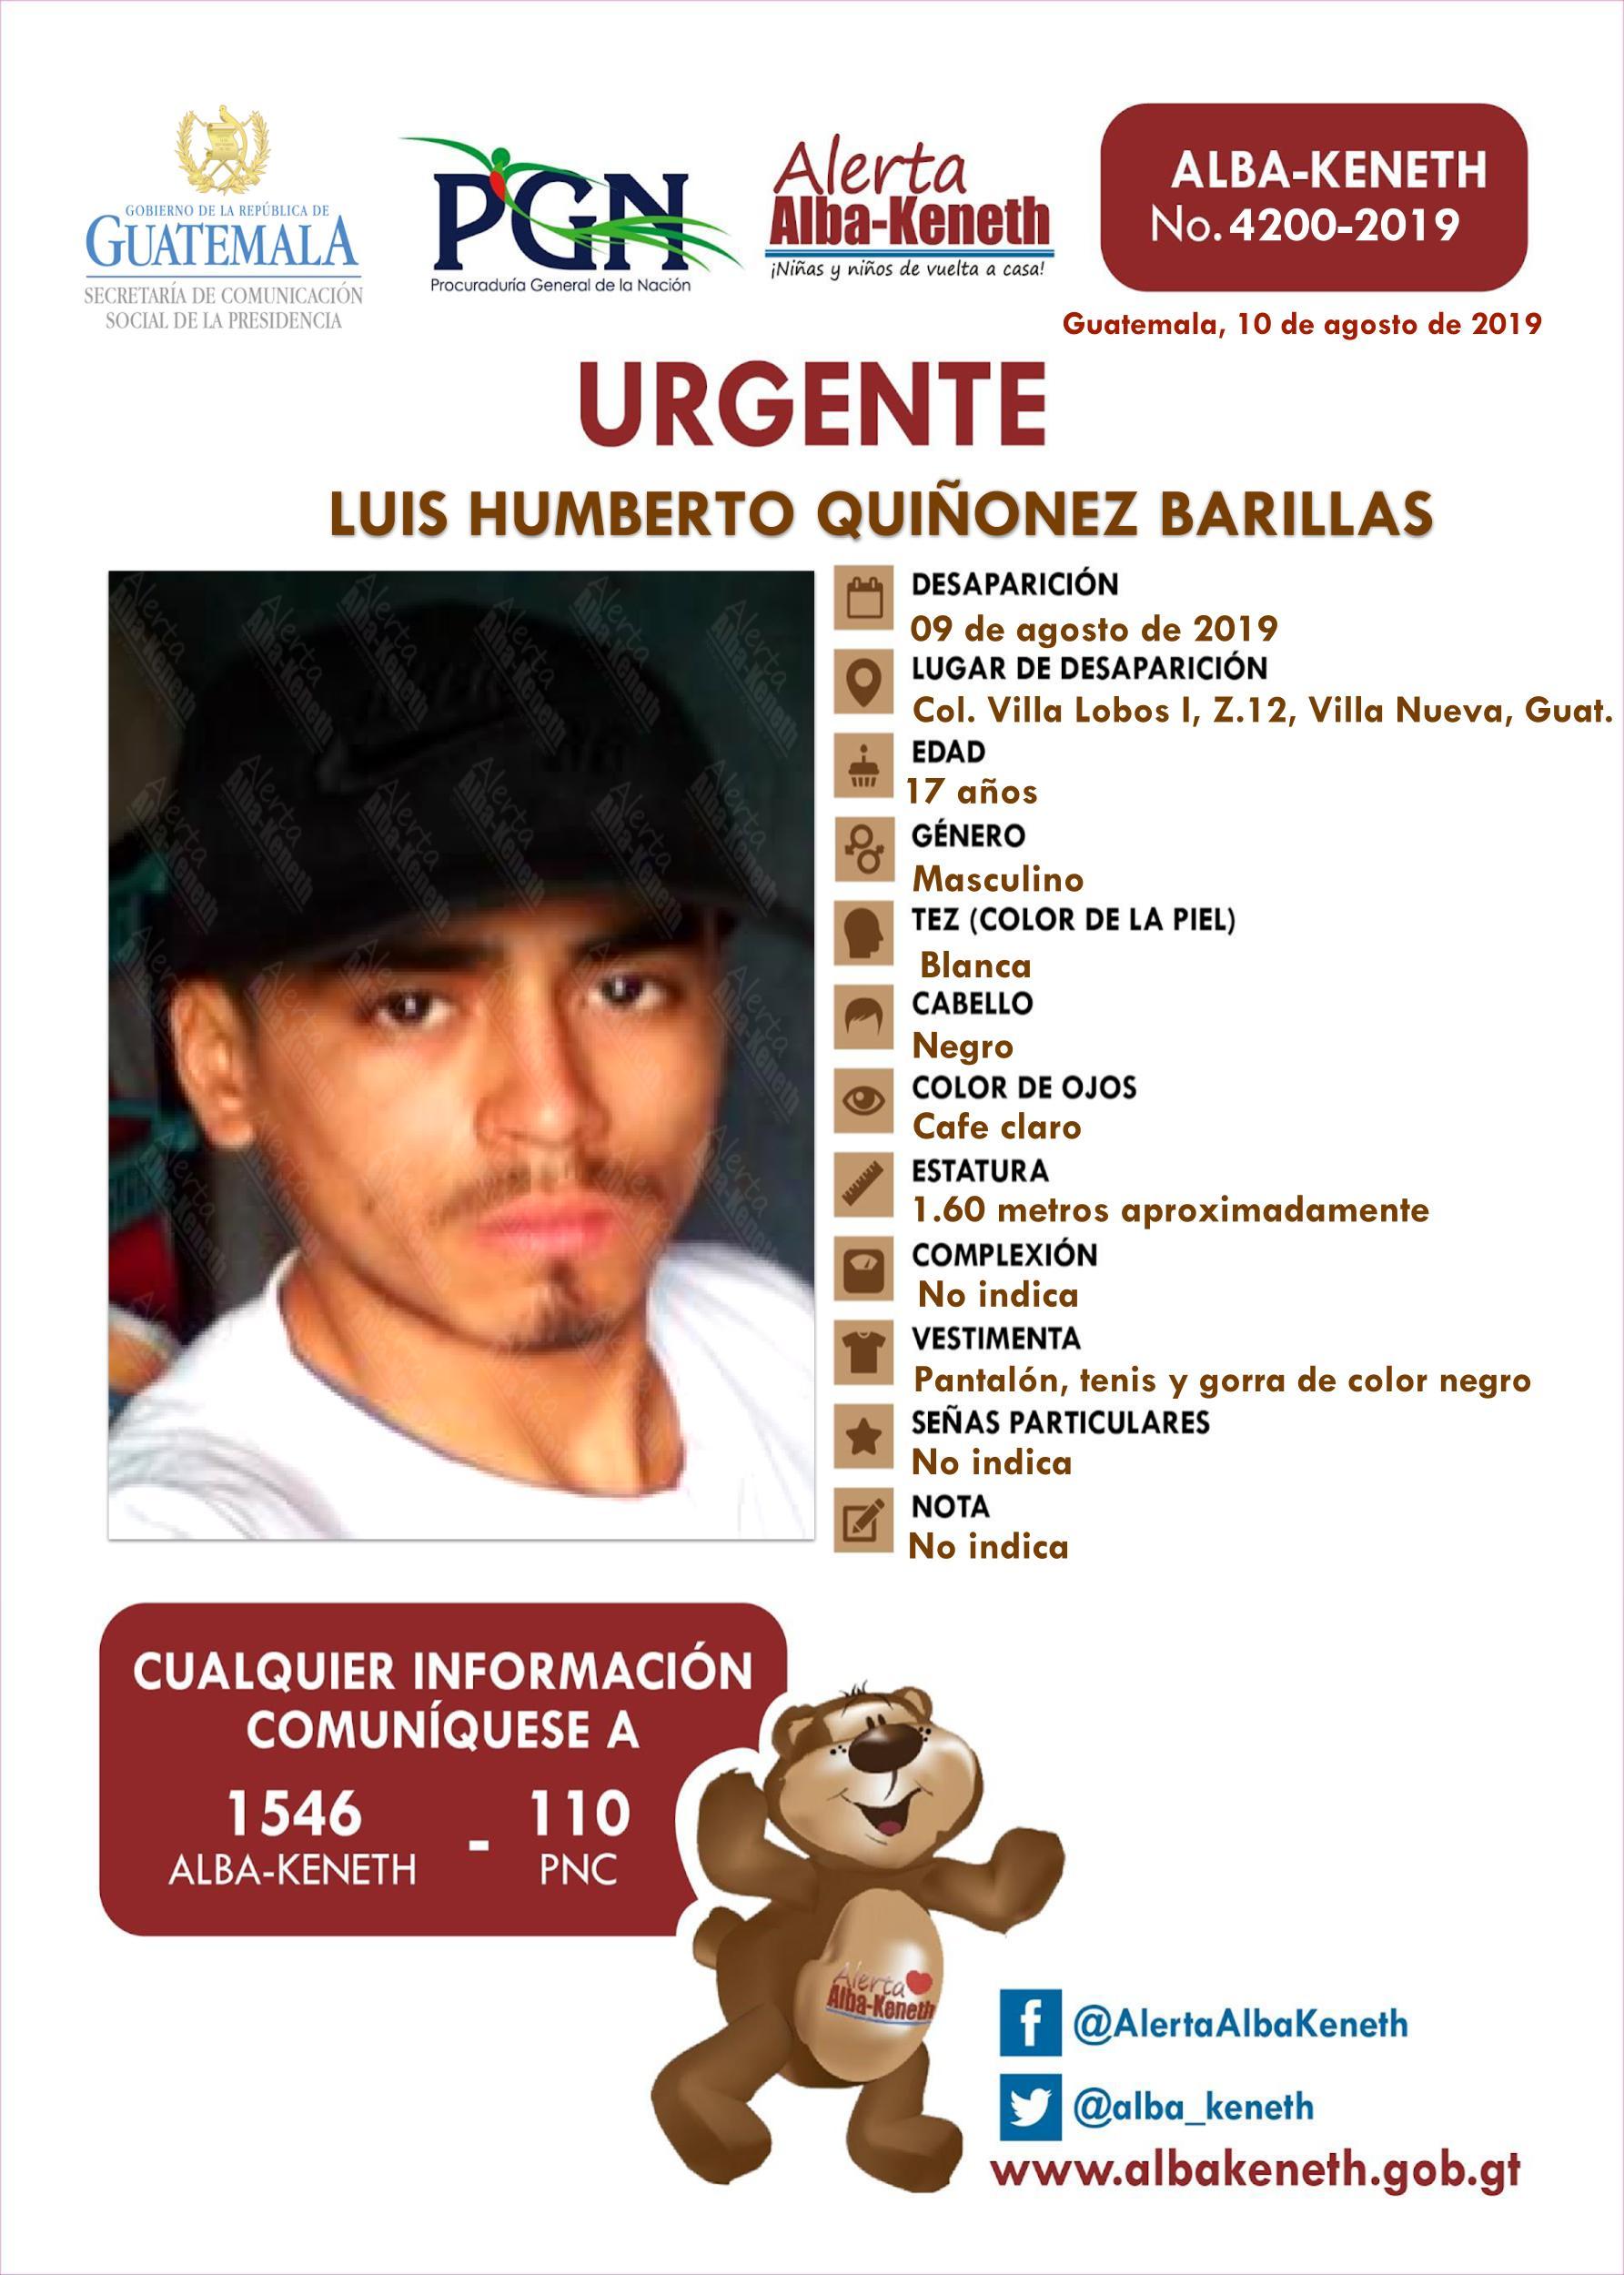 Luis Humberto Quiñonez Barillas